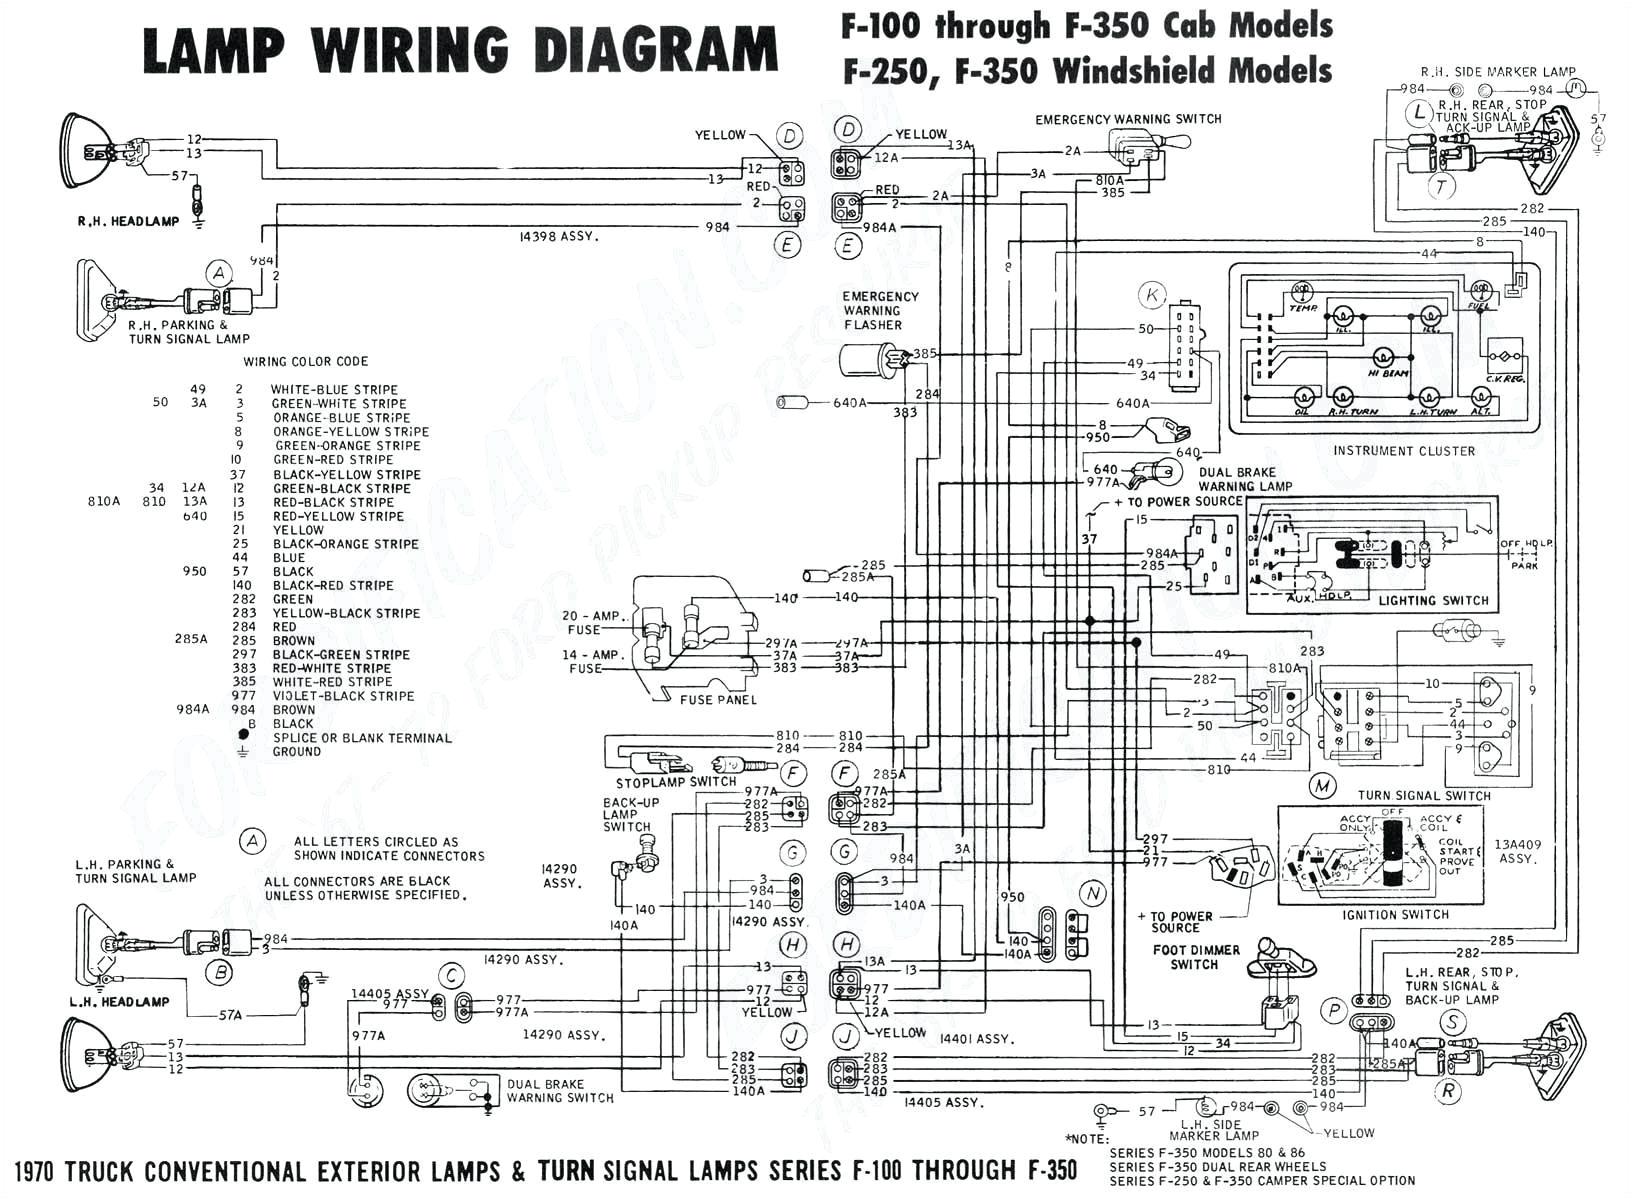 2003 Yamaha Kodiak 400 Wiring Diagram 2009 Malibu Wiring Schematics Bcm Wiring Diagram Expert